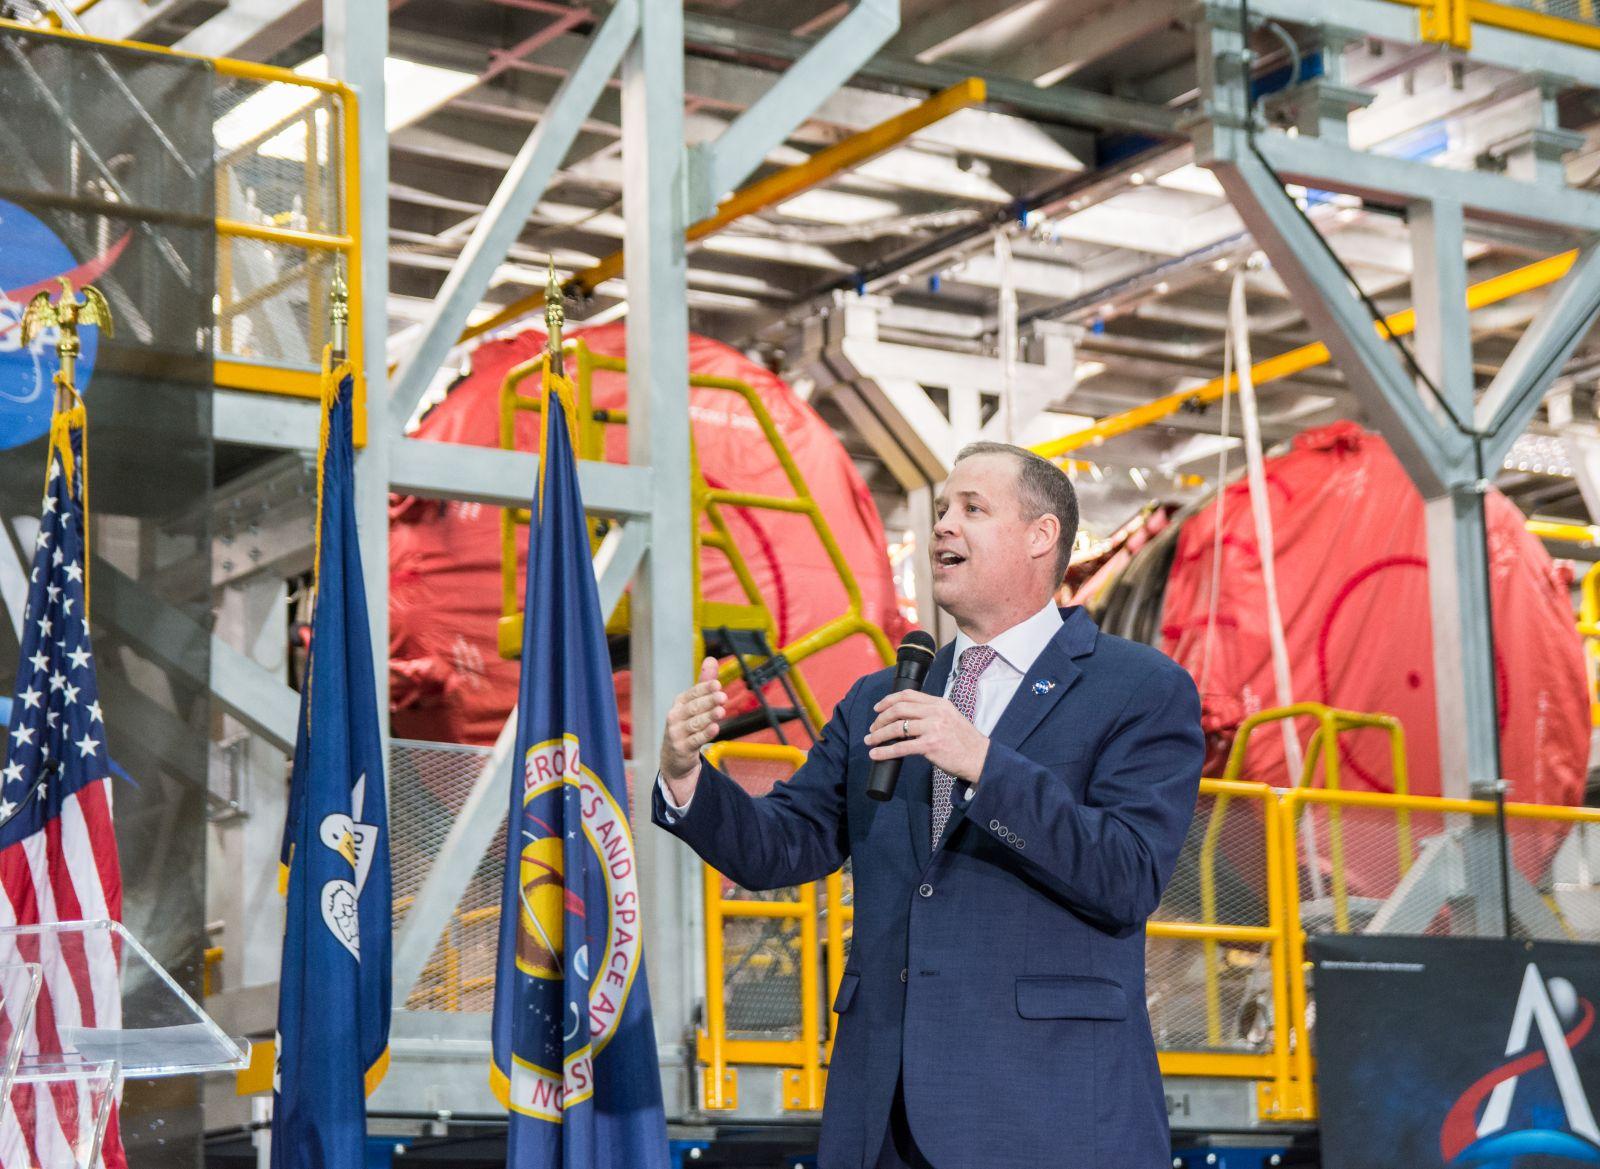 NASA Administrator Bridenstine declares SLS core stage complete